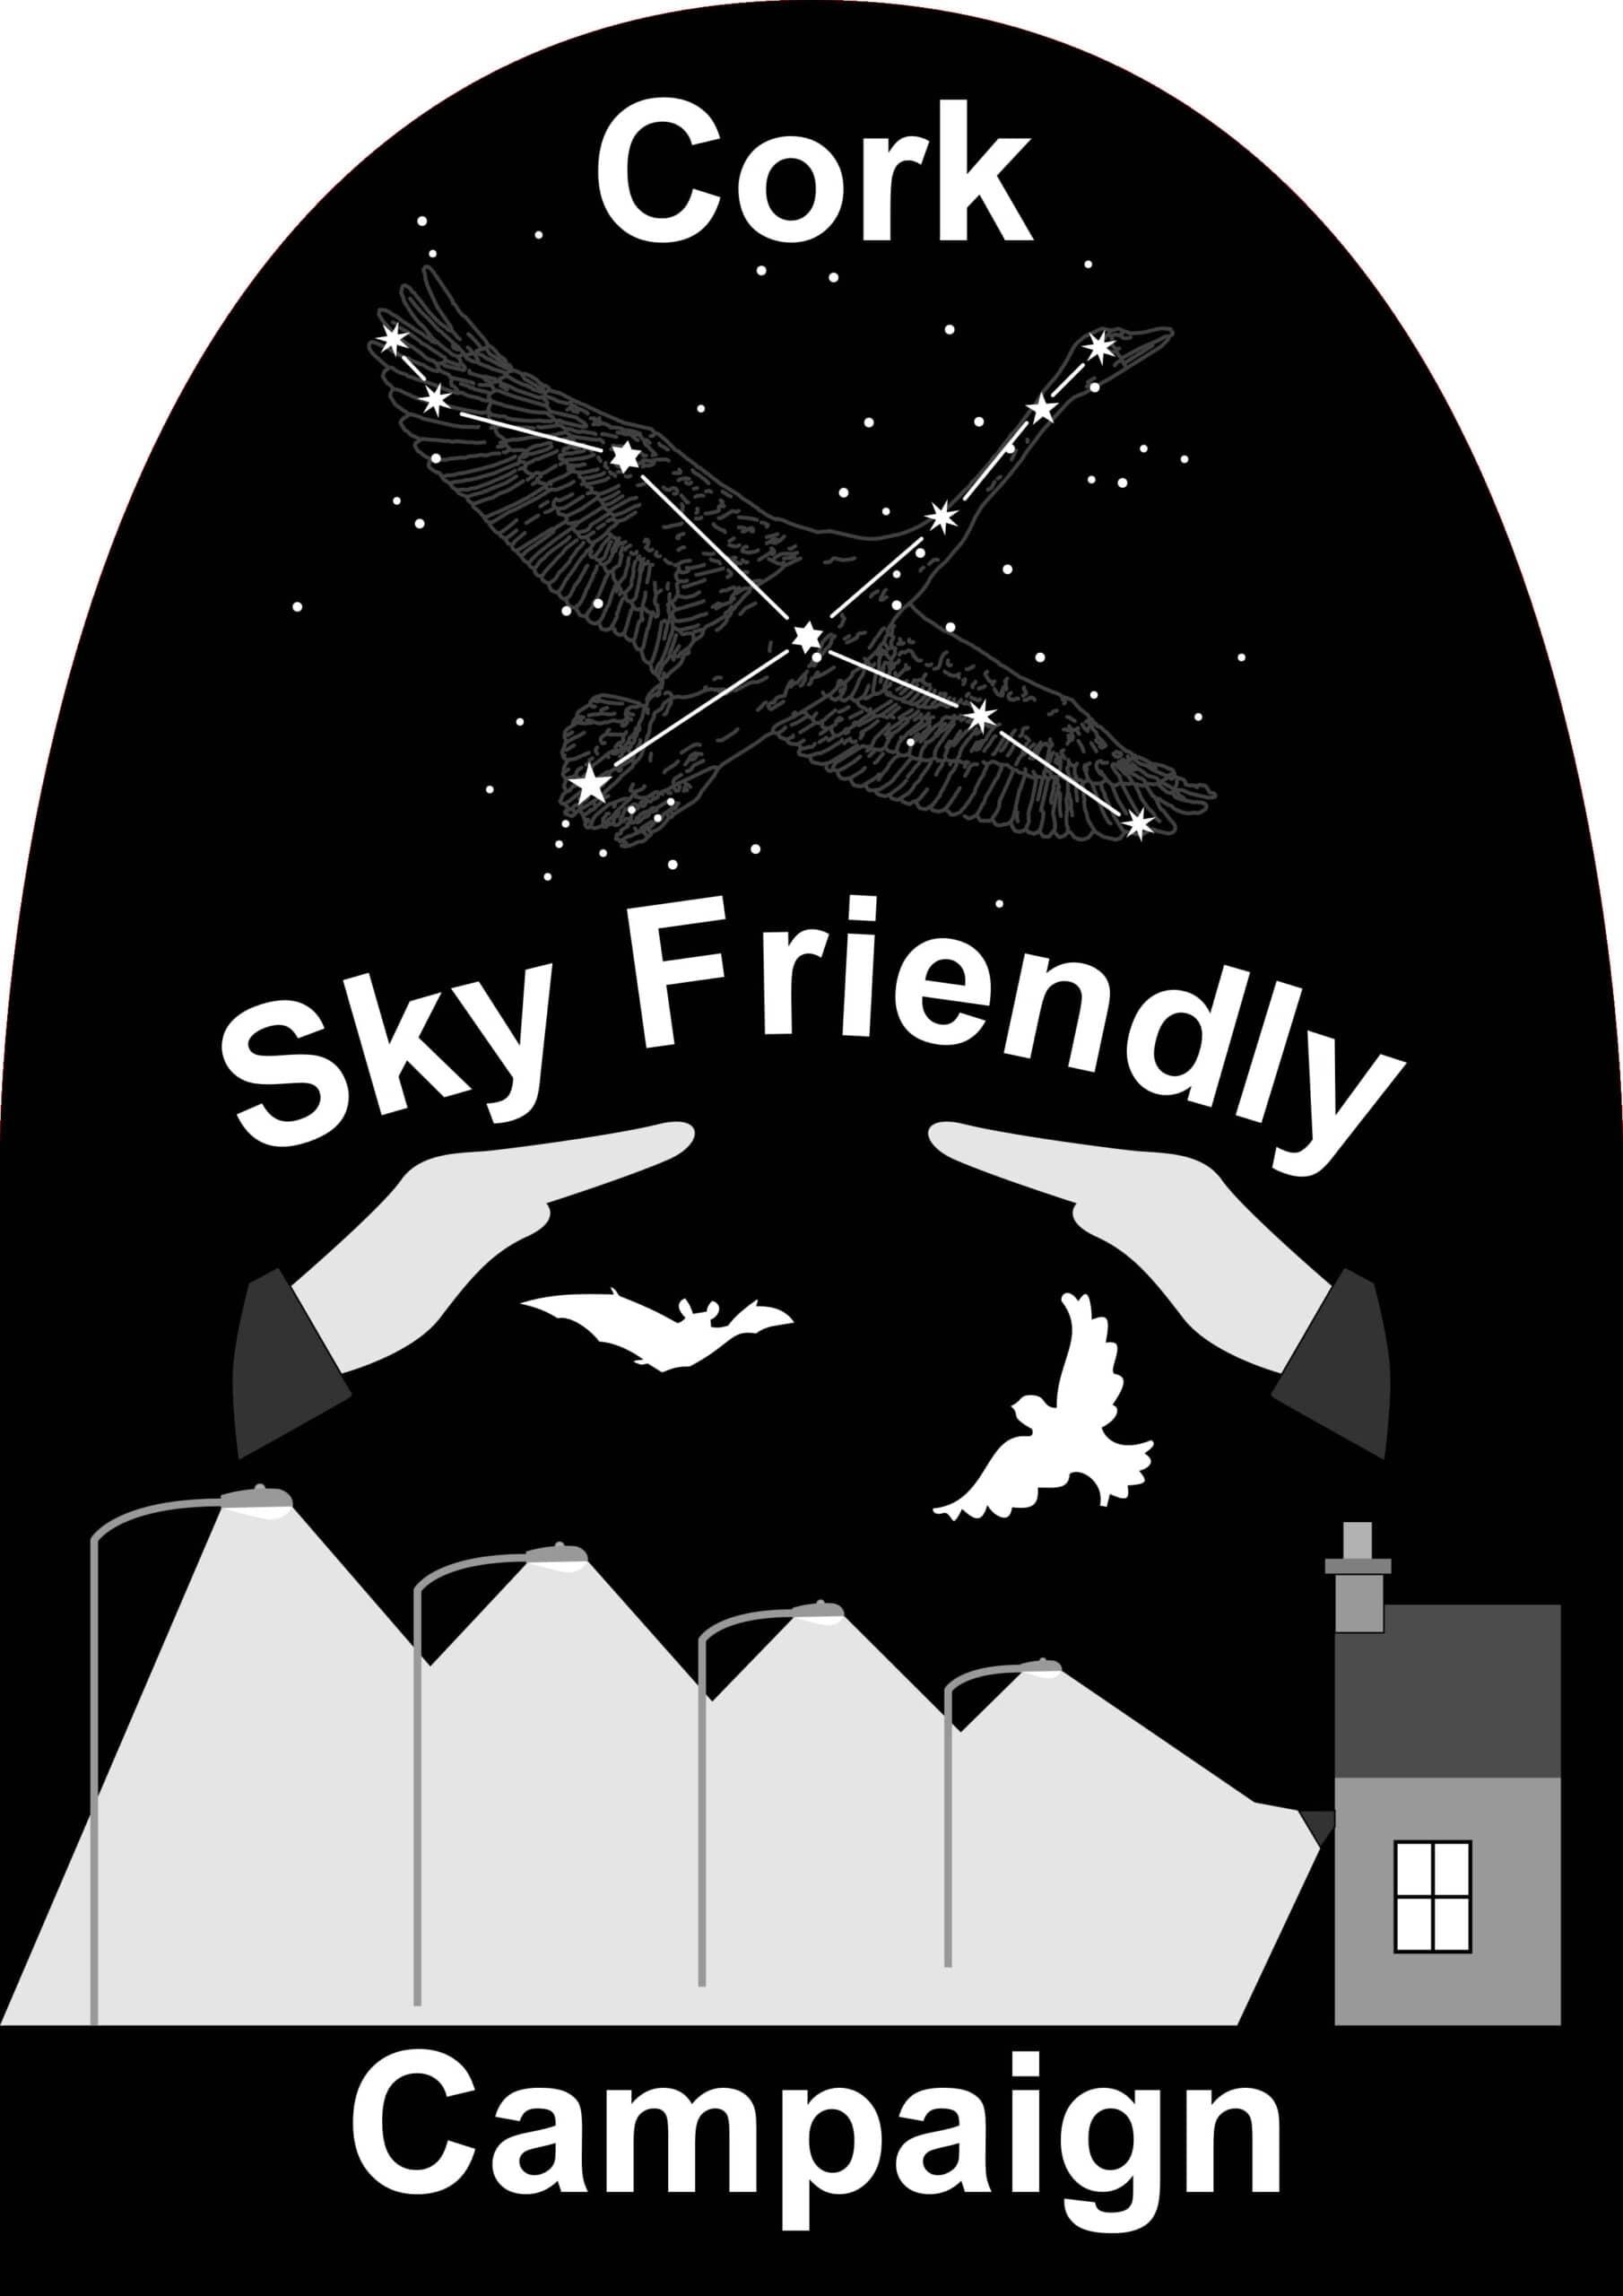 Cork Sky Friendly Campaign logo